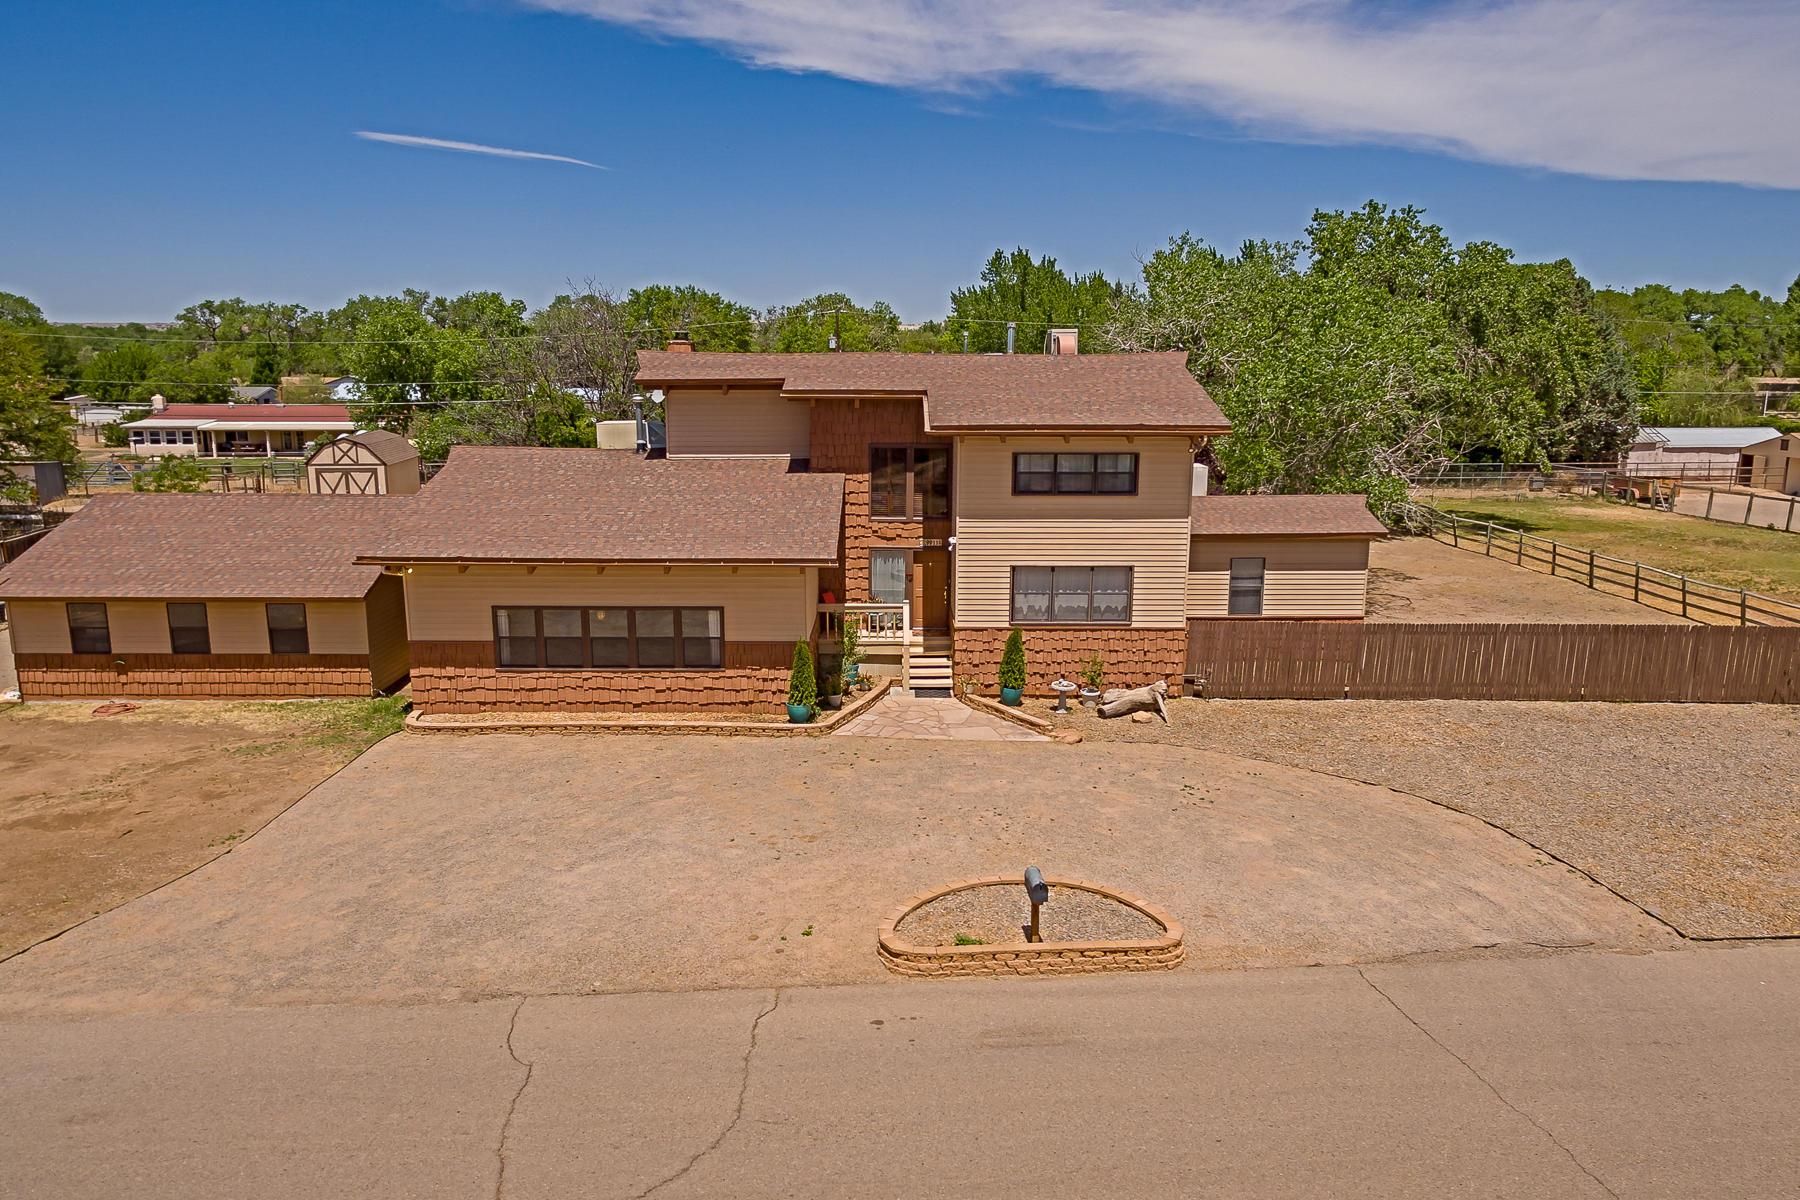 9911 NW Eldridge Road, Northwest Albuquerque and Northwest Heights, New Mexico